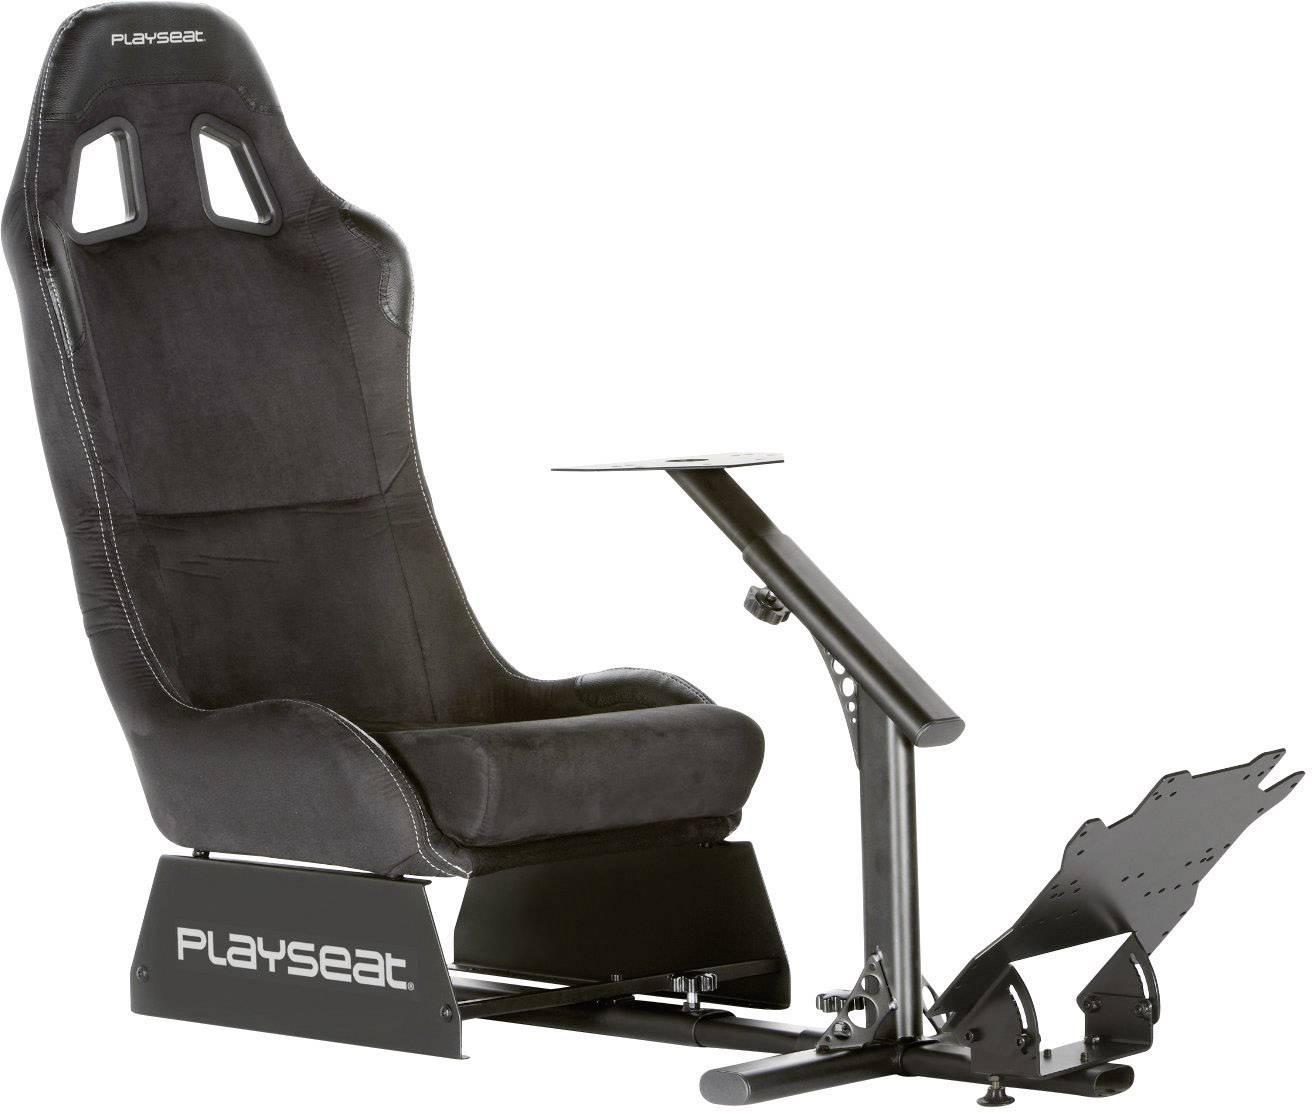 Sedile di pilotaggio Playseats